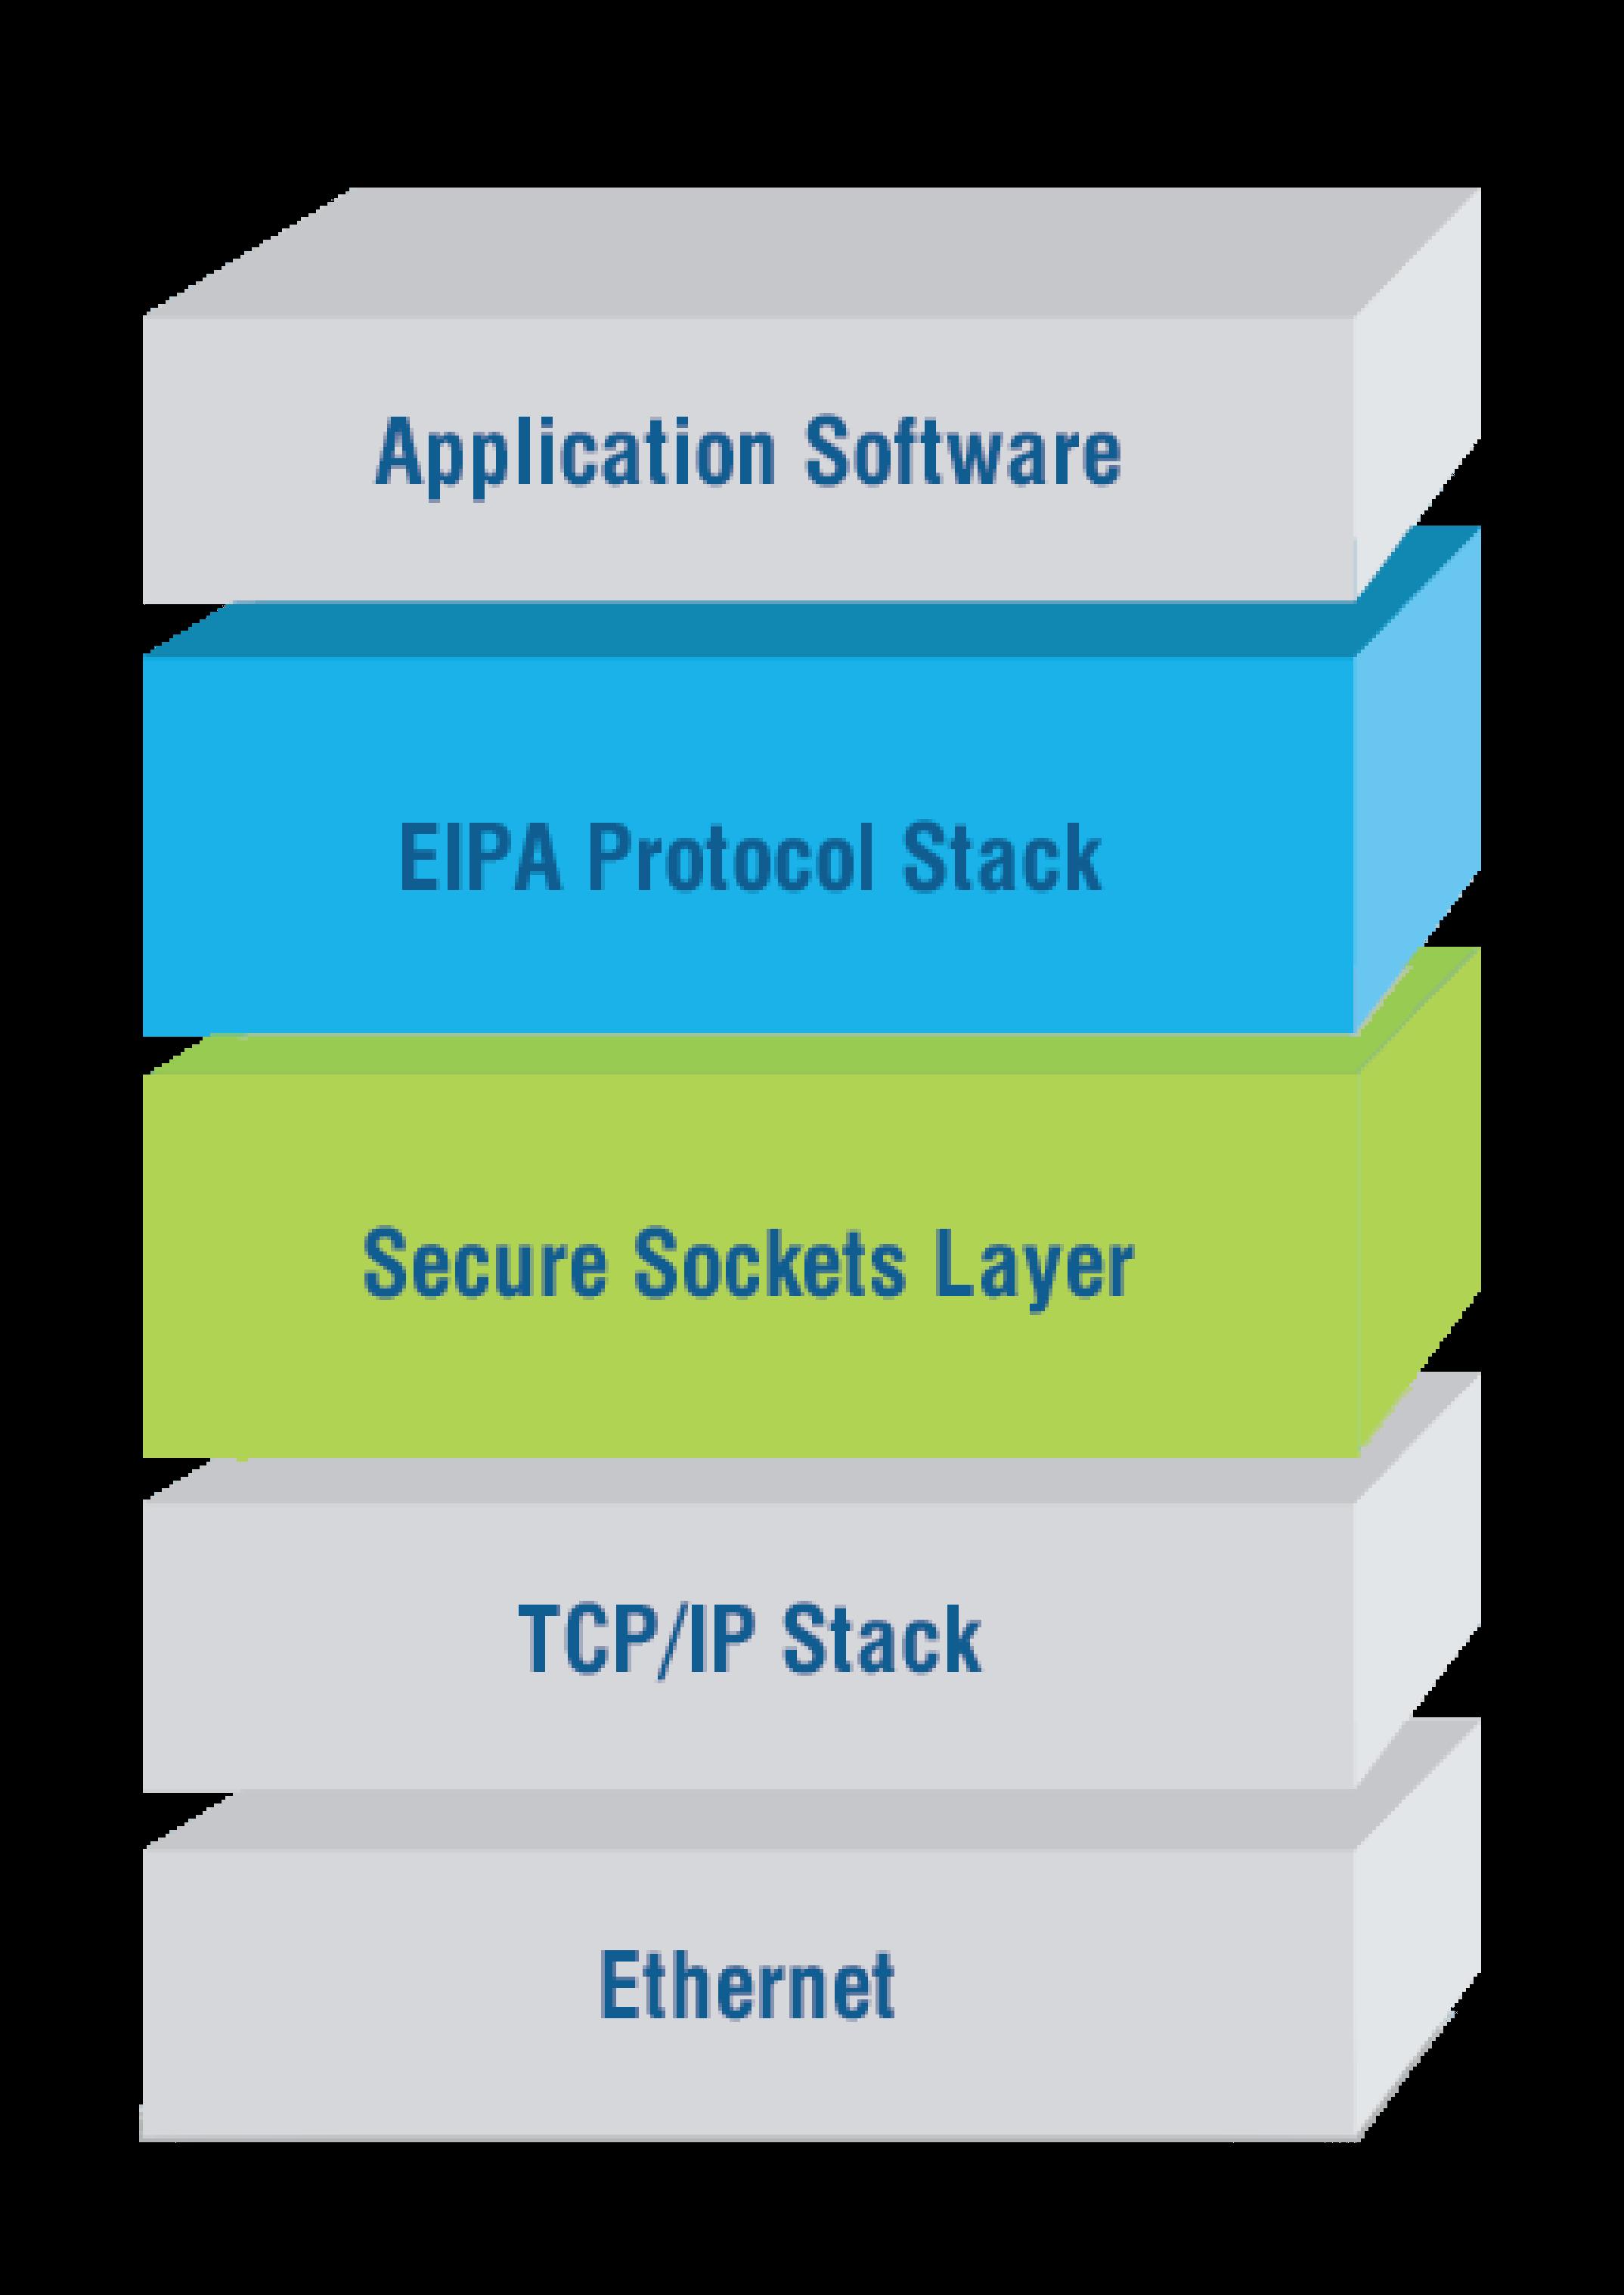 EIPA CIP Security